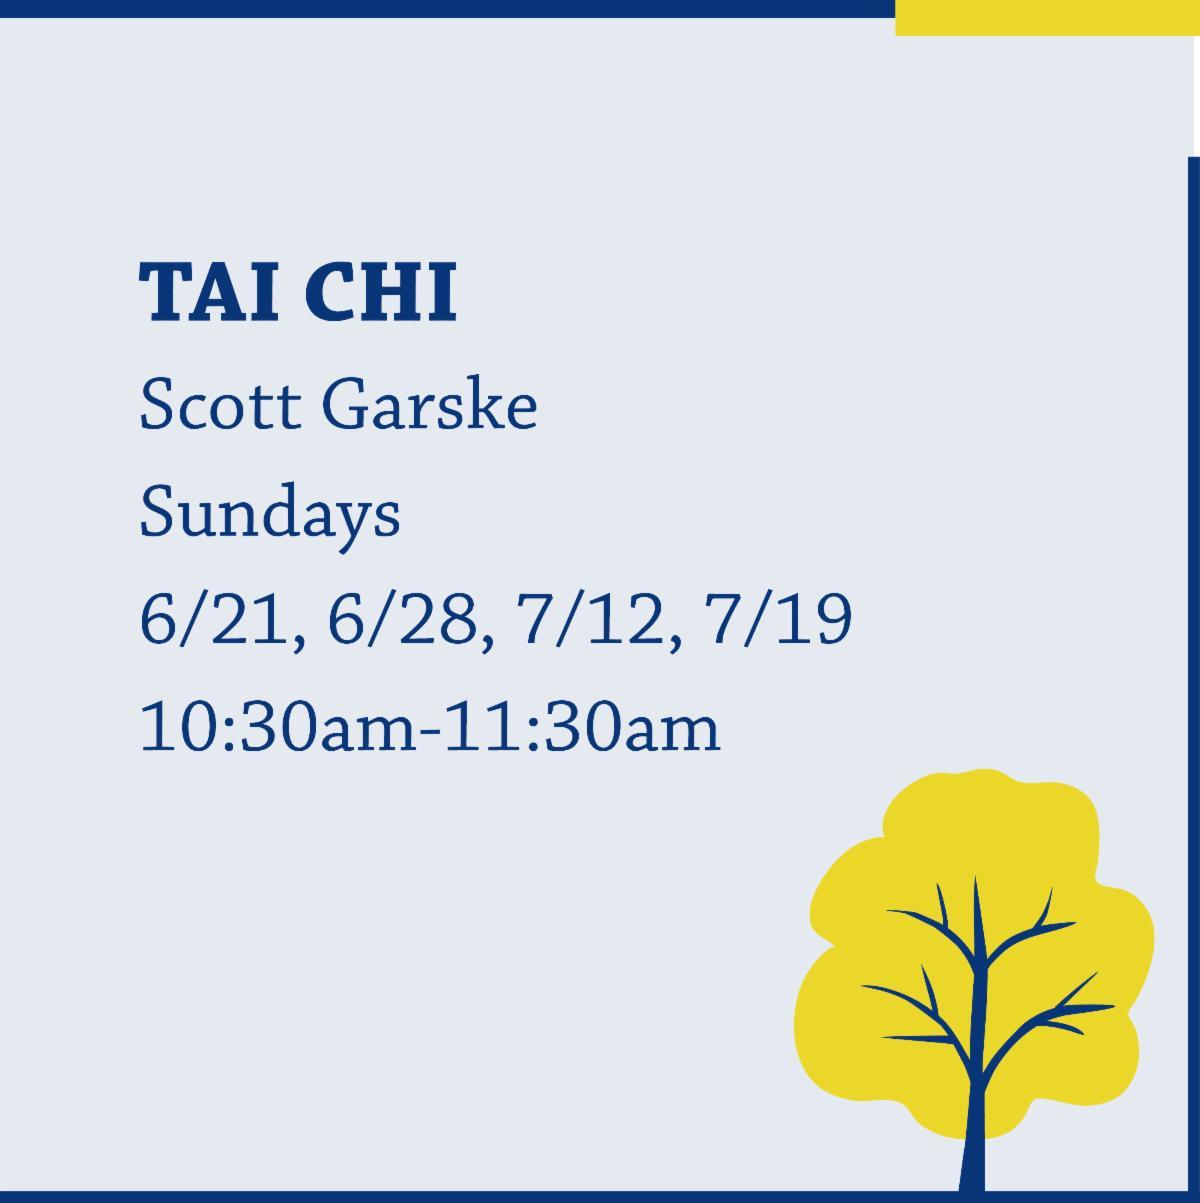 Tai Chi with Scott Garske on Sundays from 10:30am-11:30am